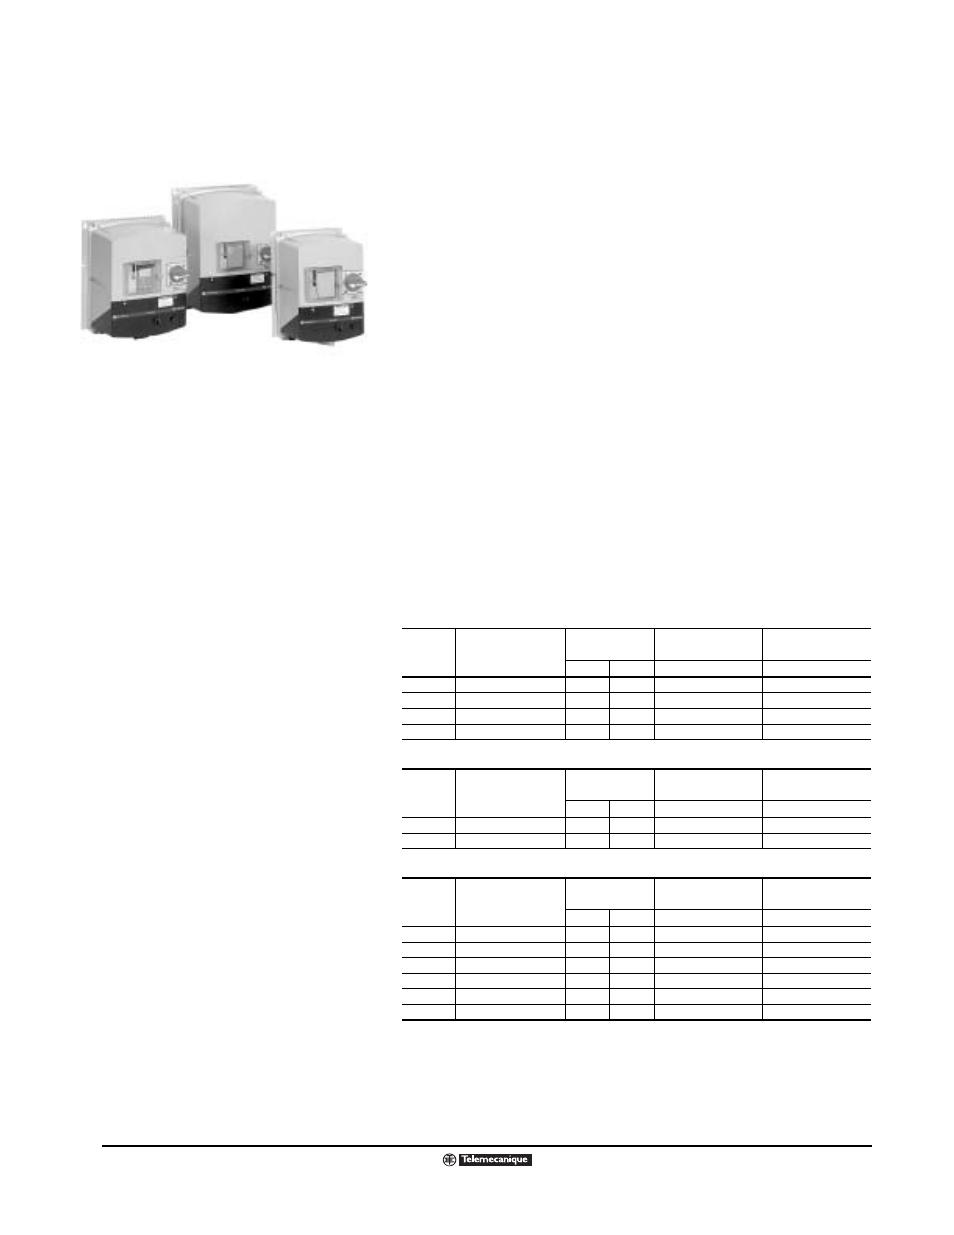 atv58 trx type e drive controllers altivar 58 trx ac drives rh manualsdir com Traxxas 3.3 T-Maxx 3.3 Supercharger